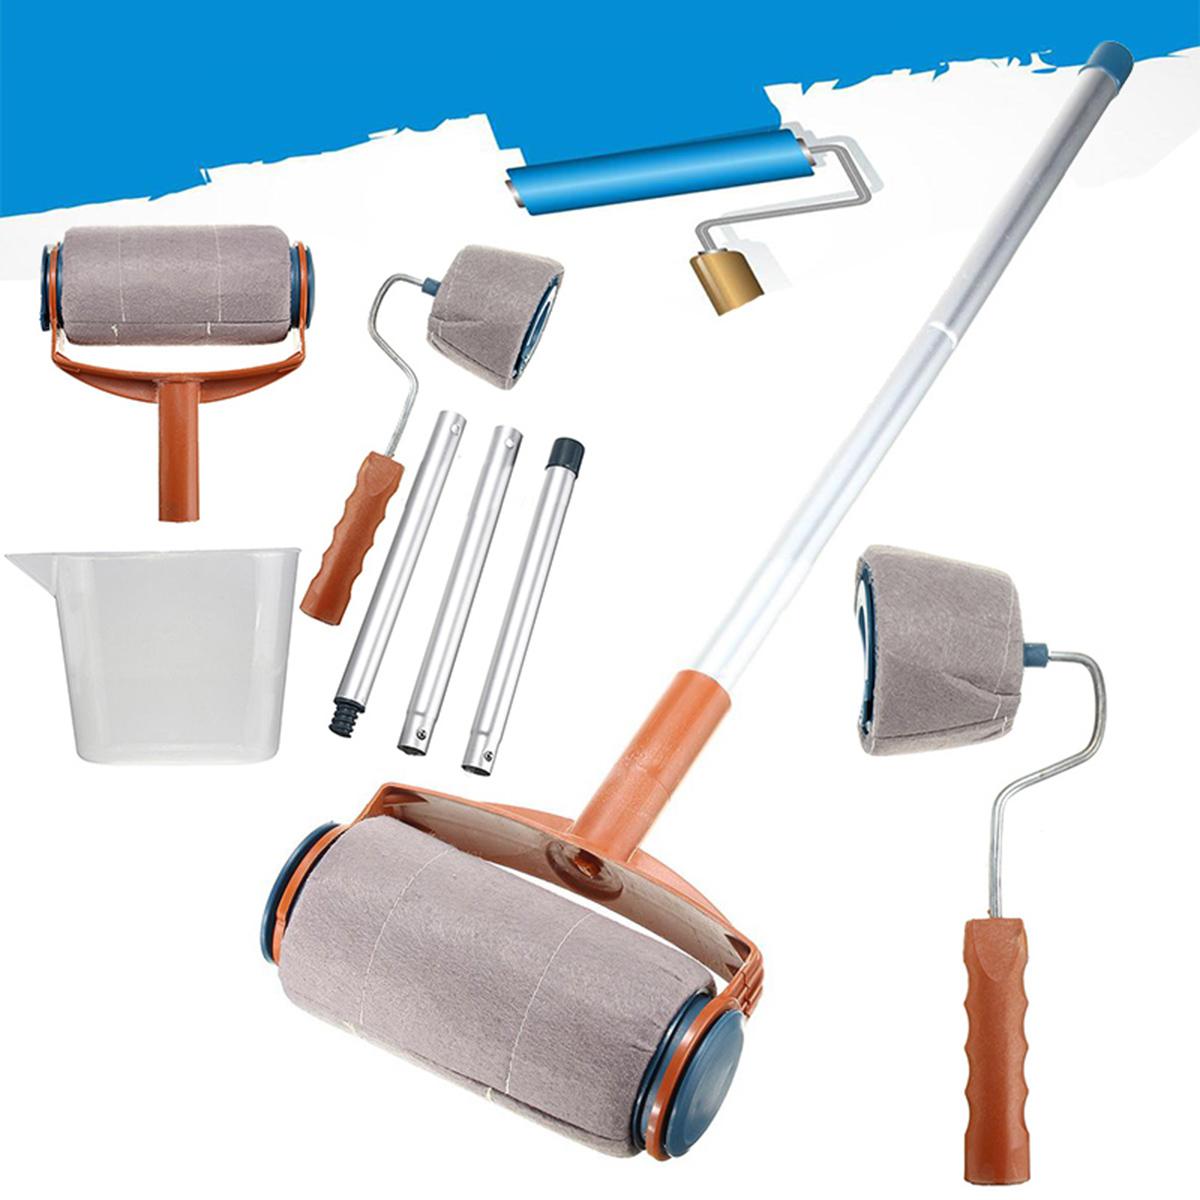 6pcs set paint roller brush handle pro flocked edger room wall painting runner k ebay. Black Bedroom Furniture Sets. Home Design Ideas